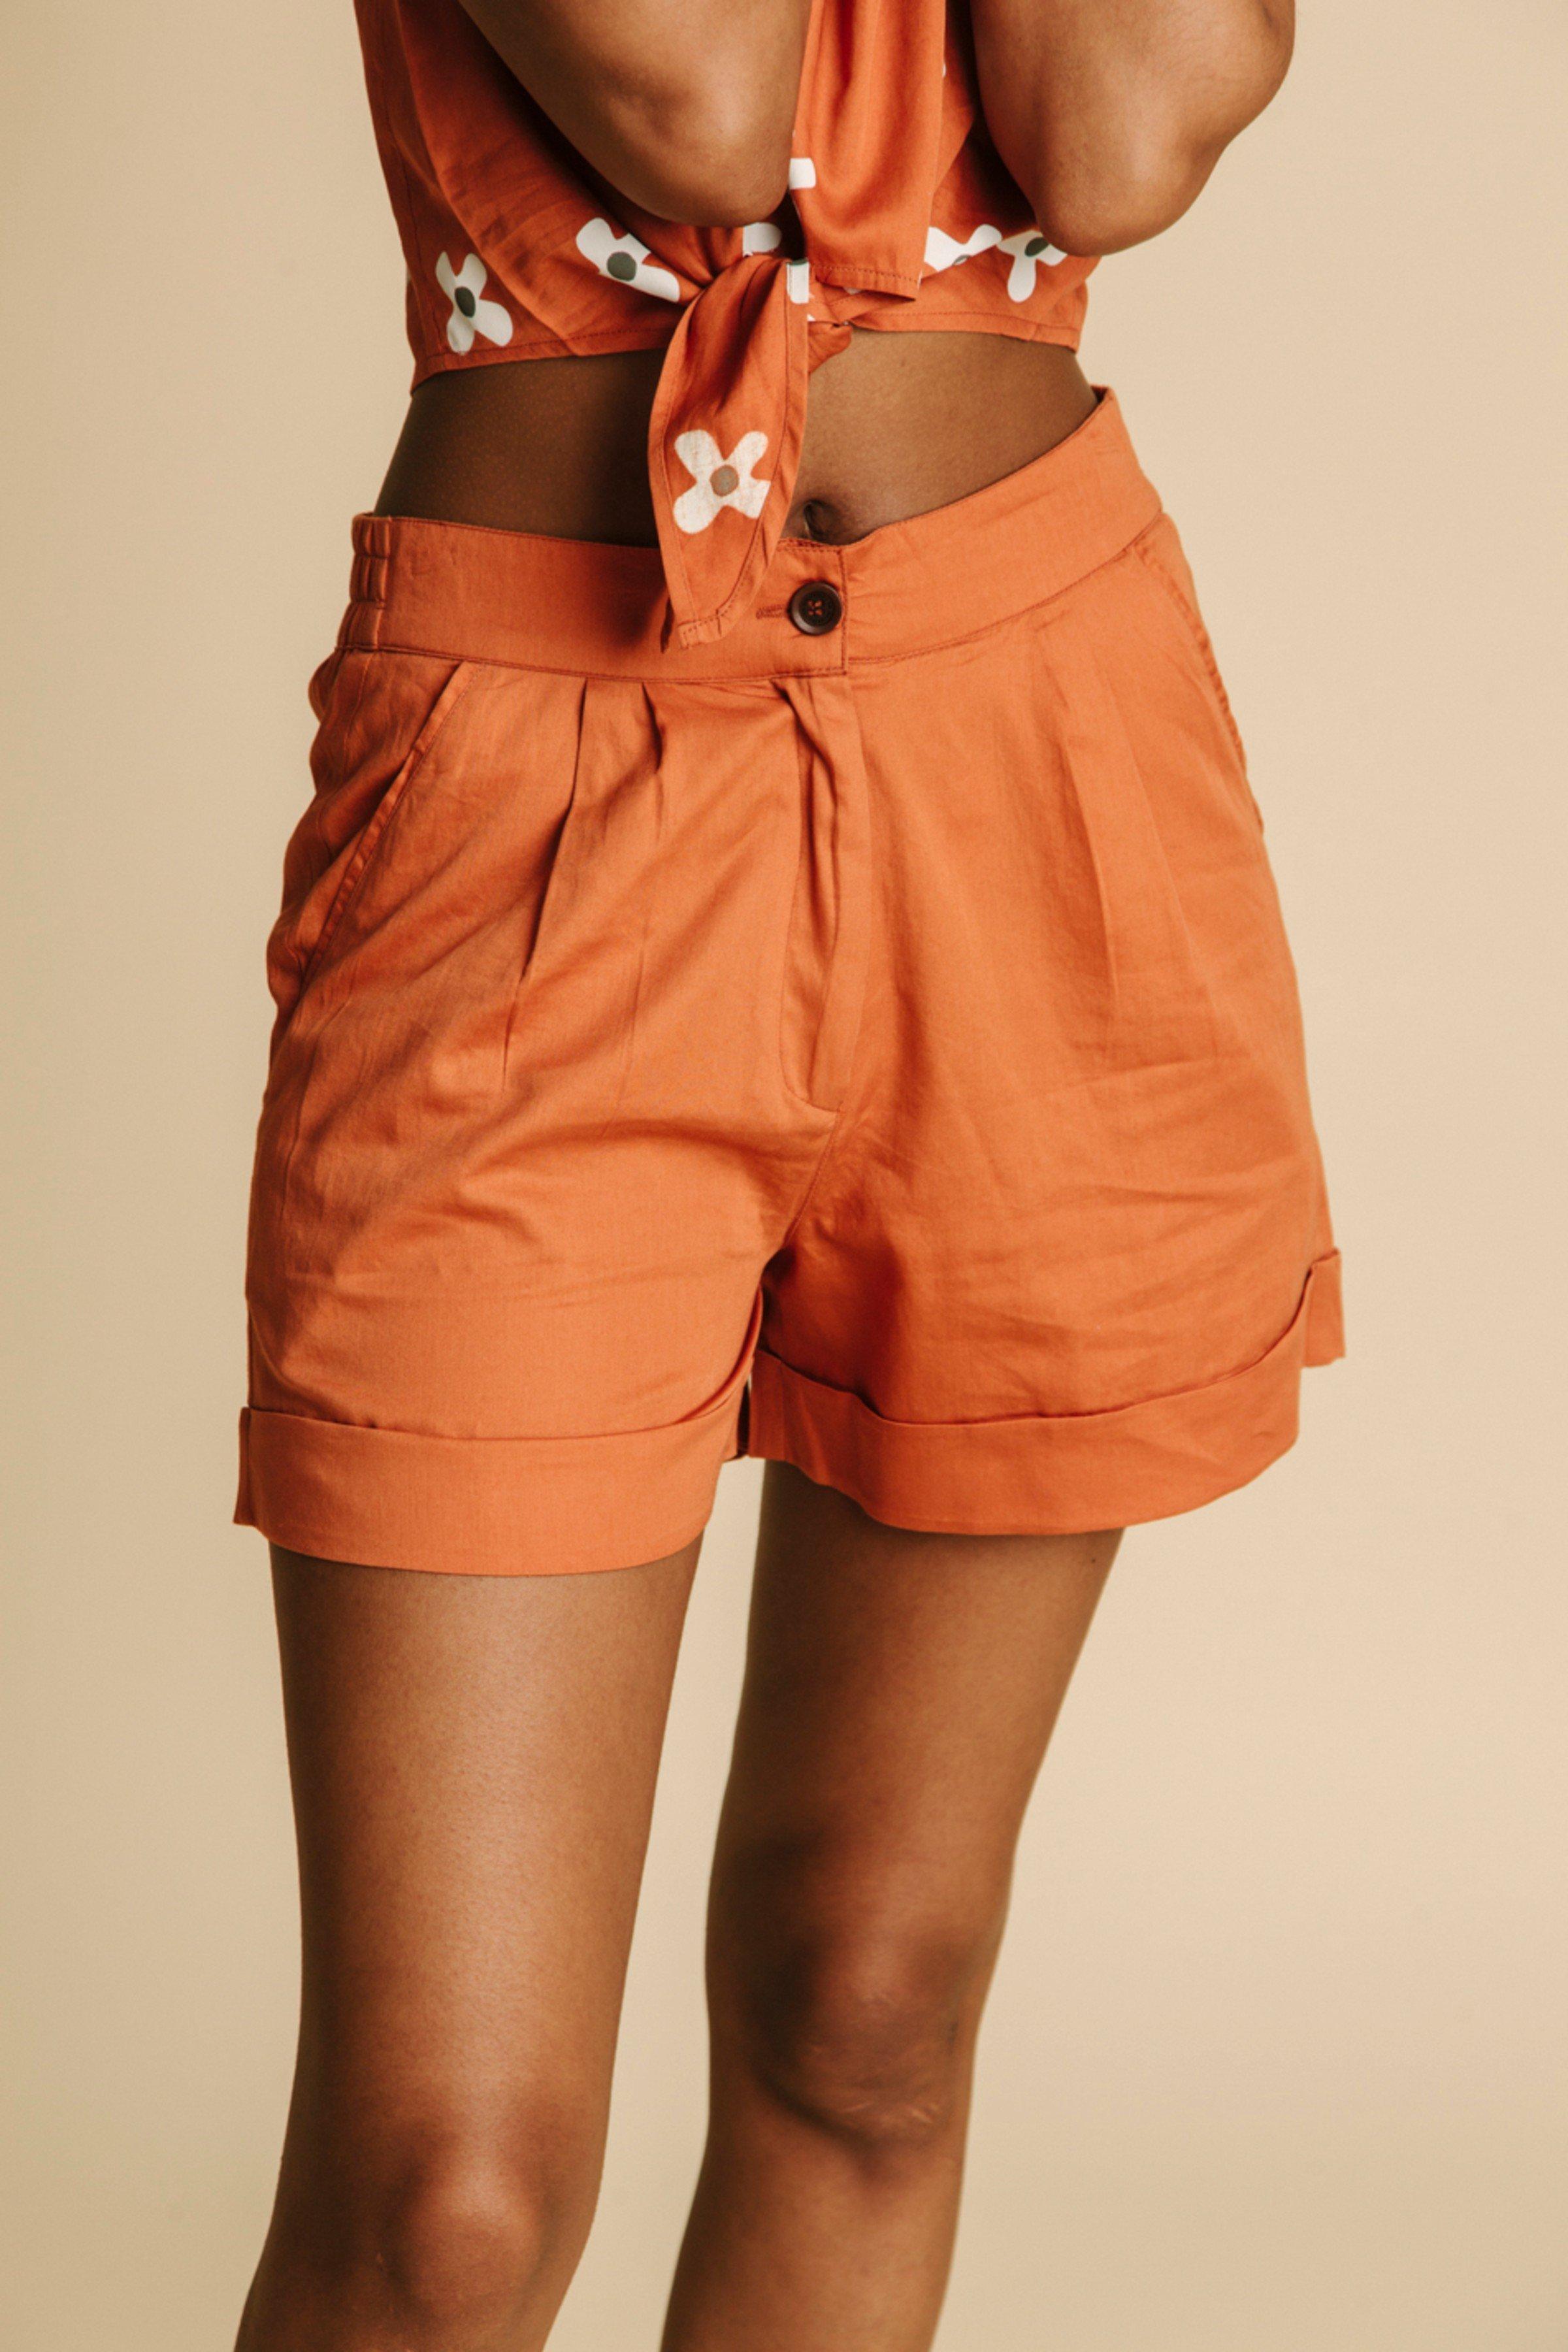 Shorts Mamma (mehrere Farben)